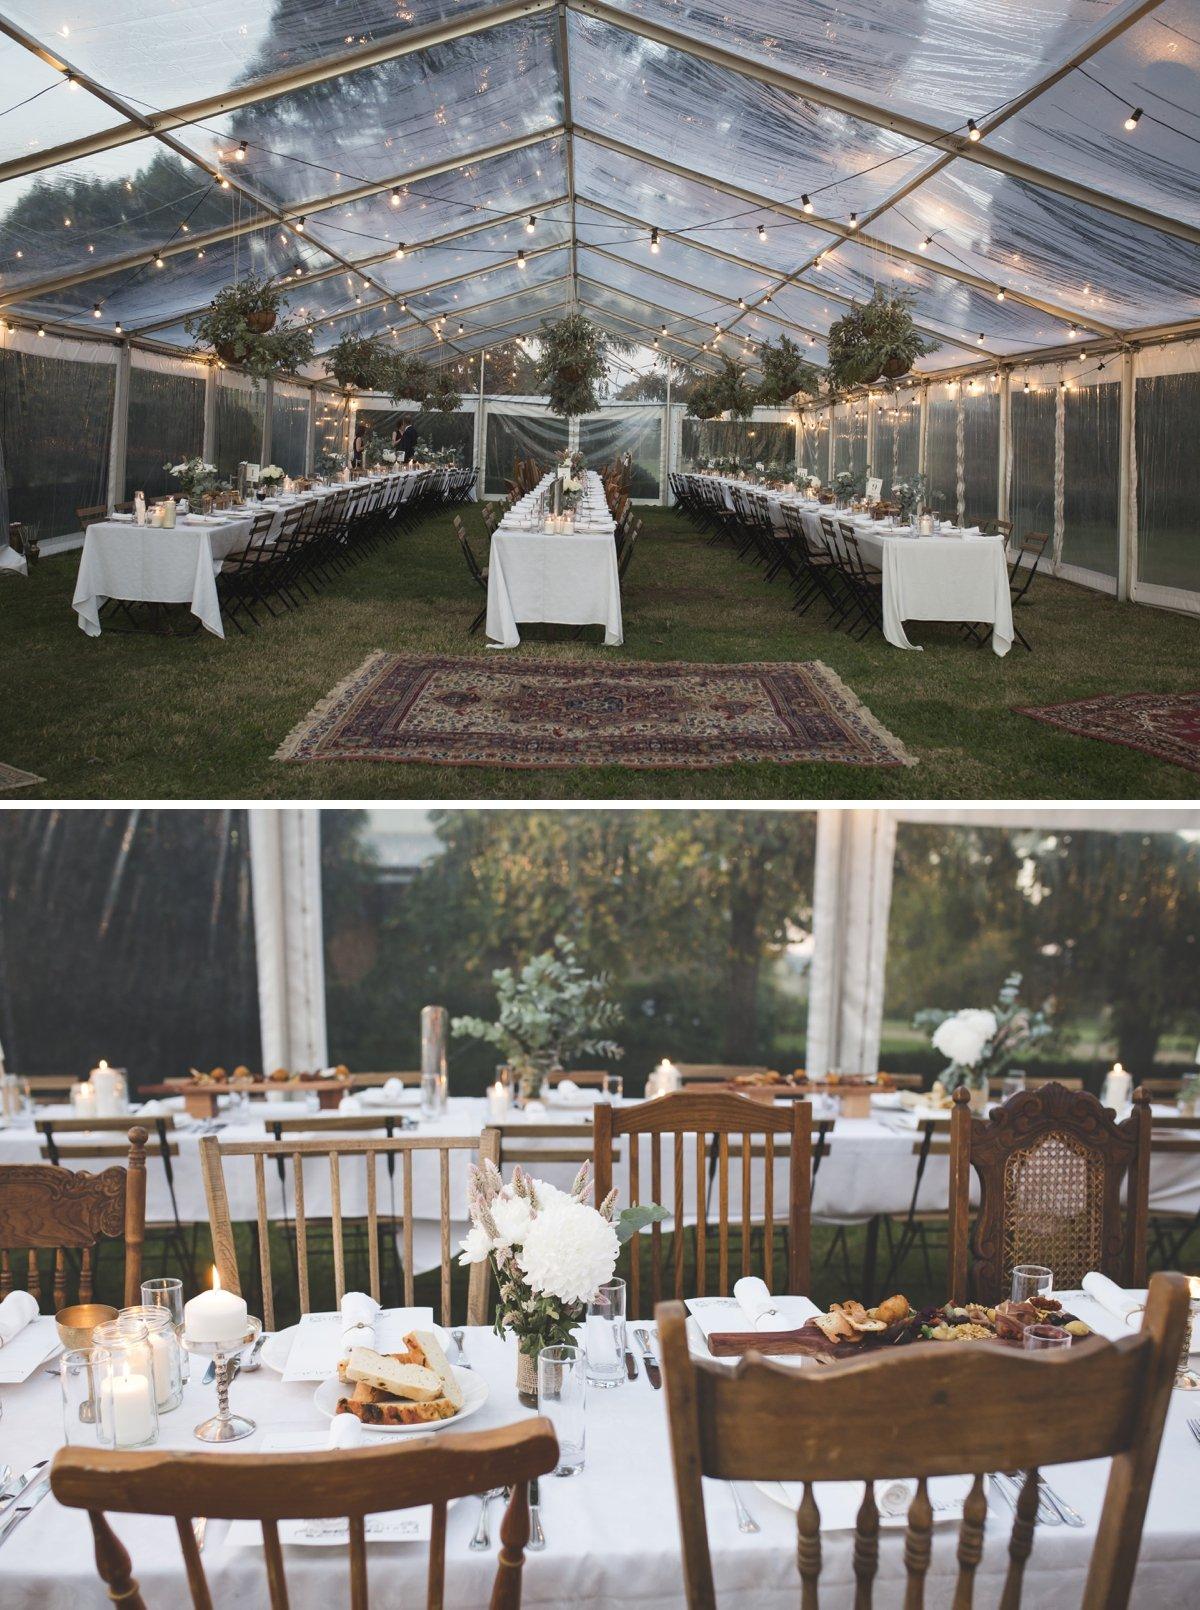 Wagga Wagga Wedding Photographer at Borambola Winery Wagga Wagga Albury wedding photographer Culcairn wedding venue_1147